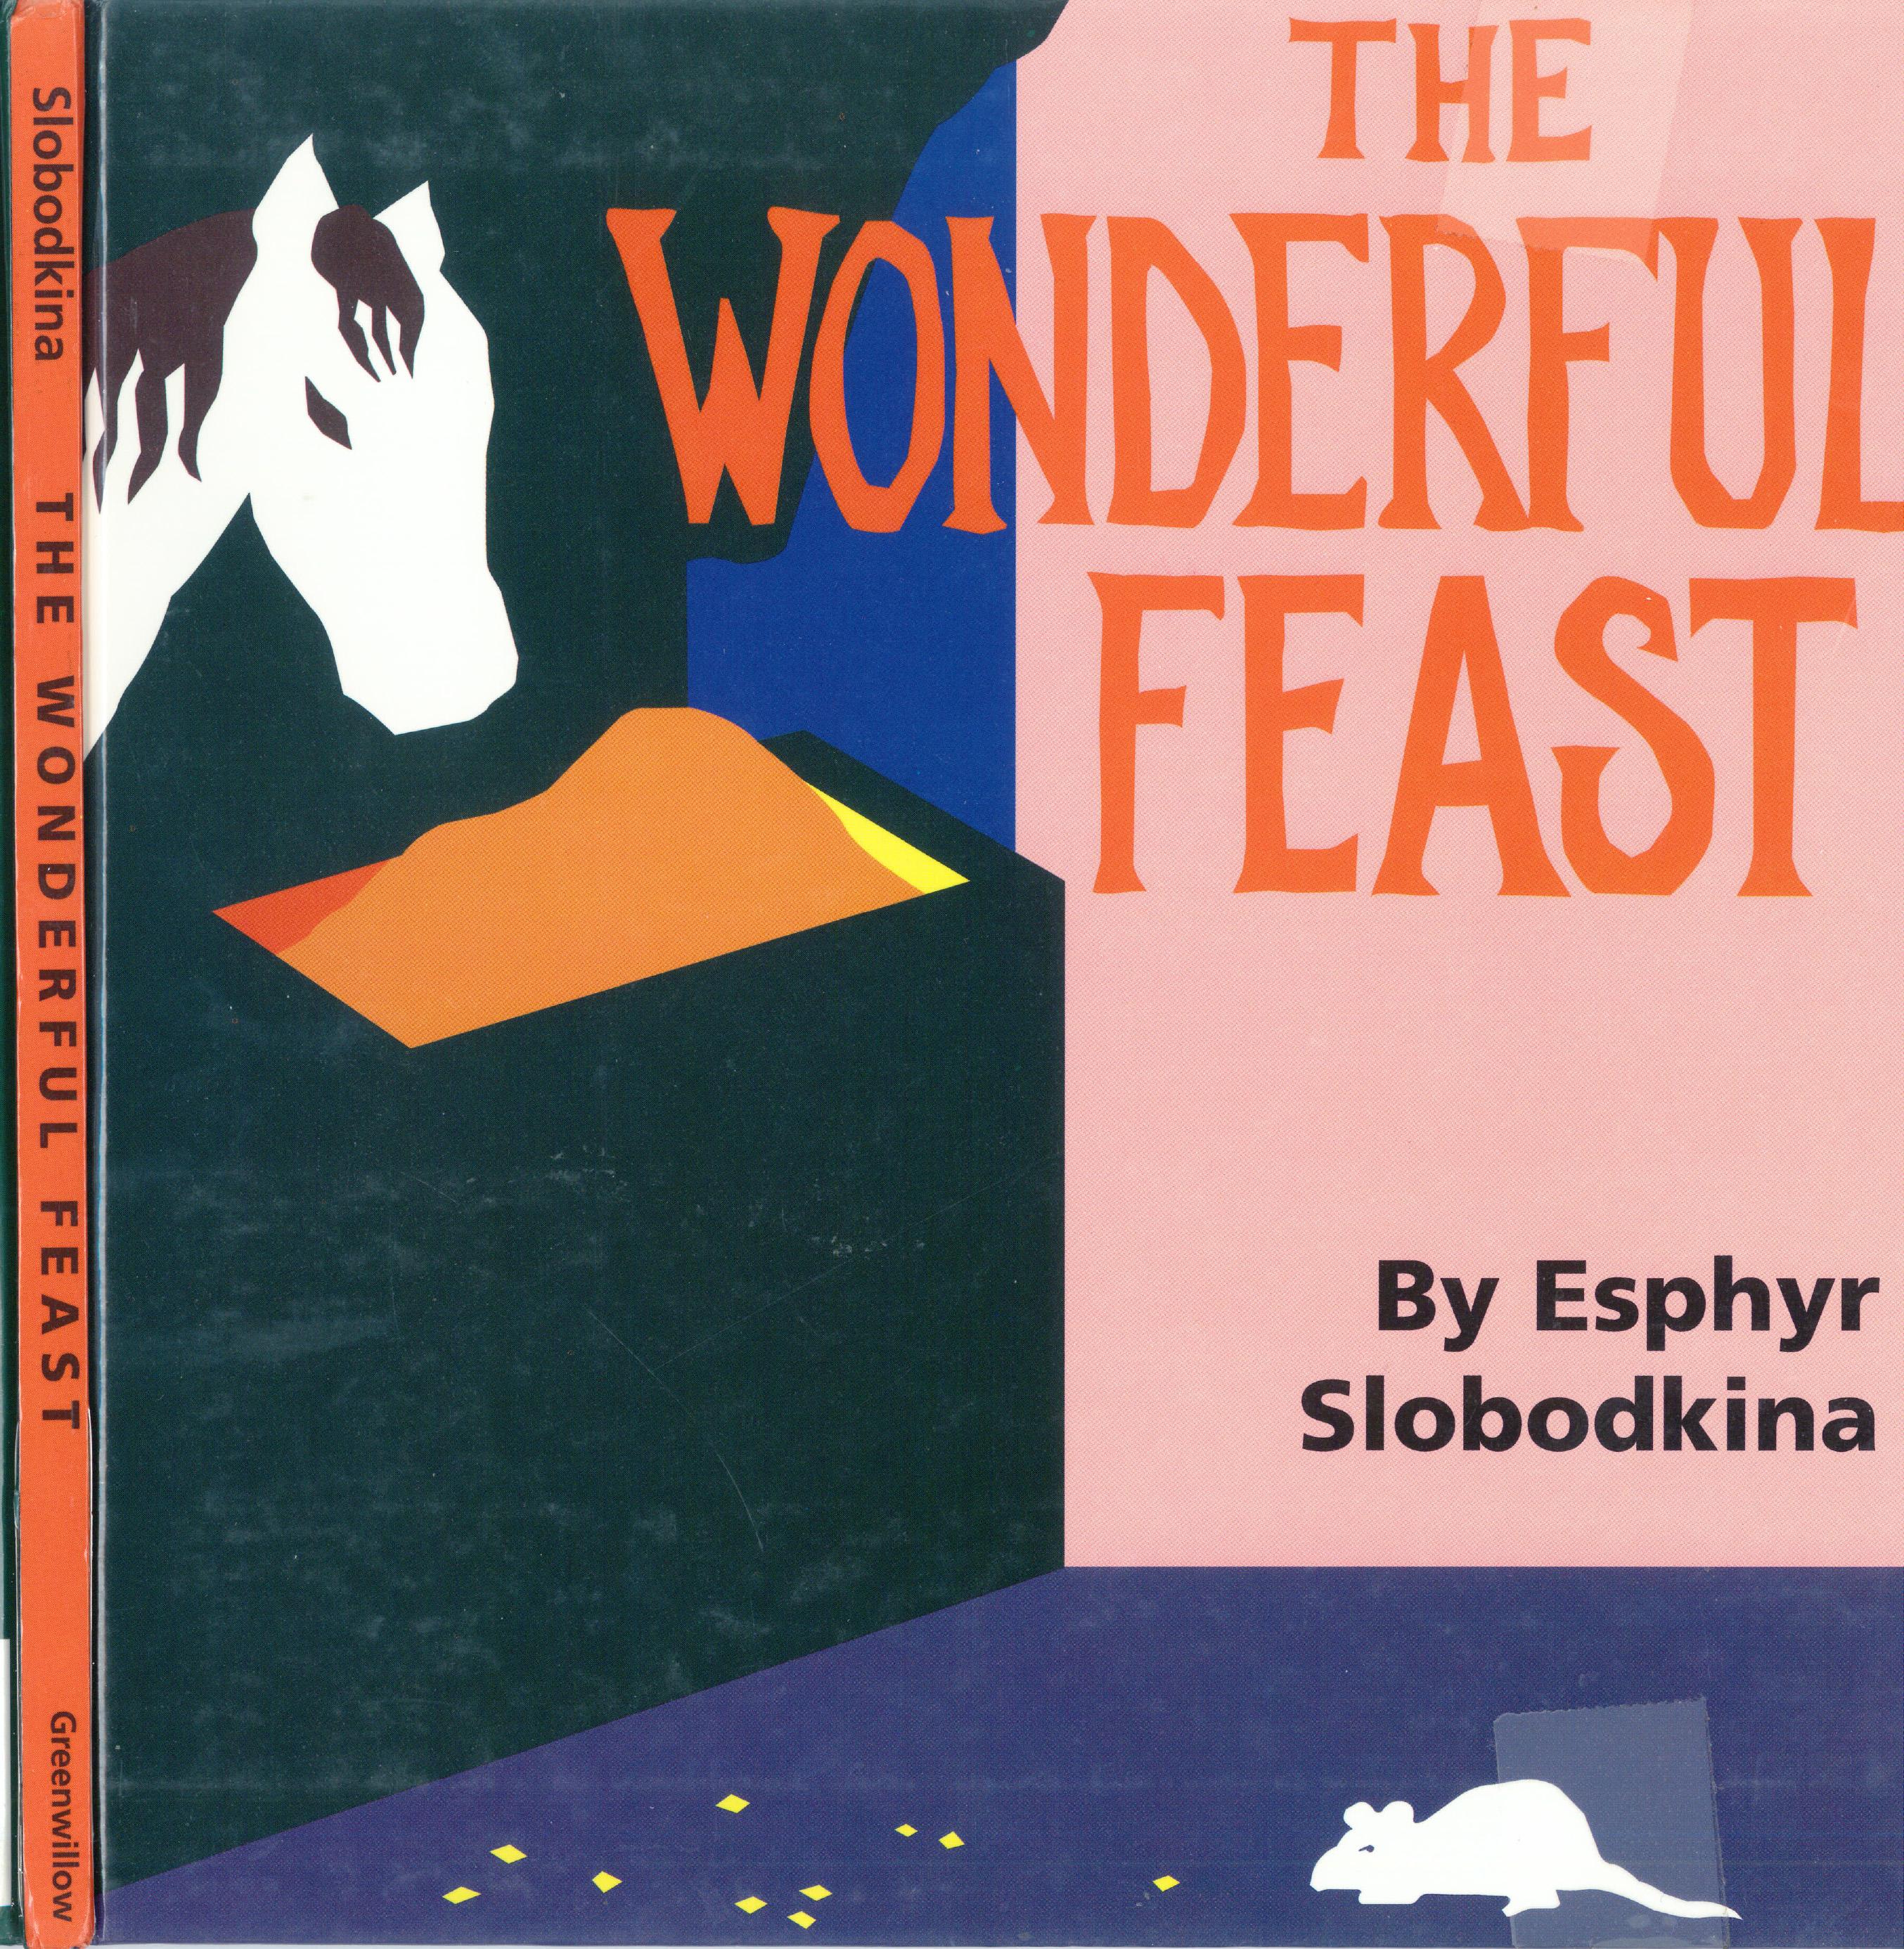 The Wonderful Feast